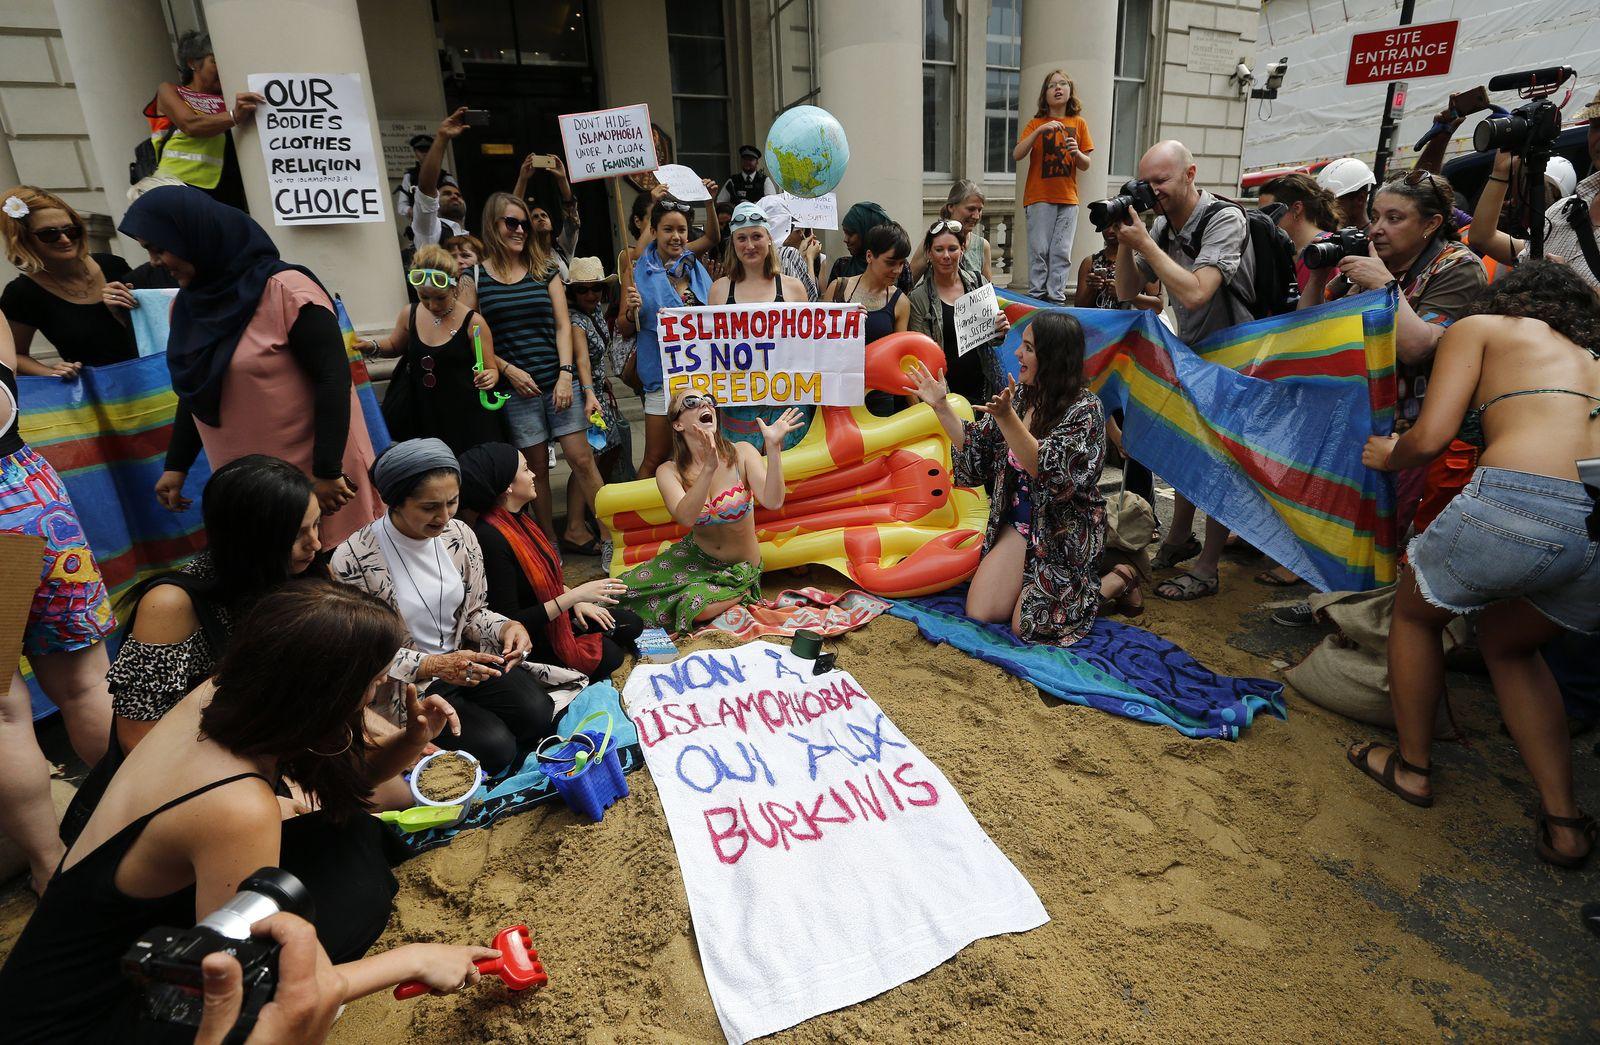 London/ Protest/ Burkini